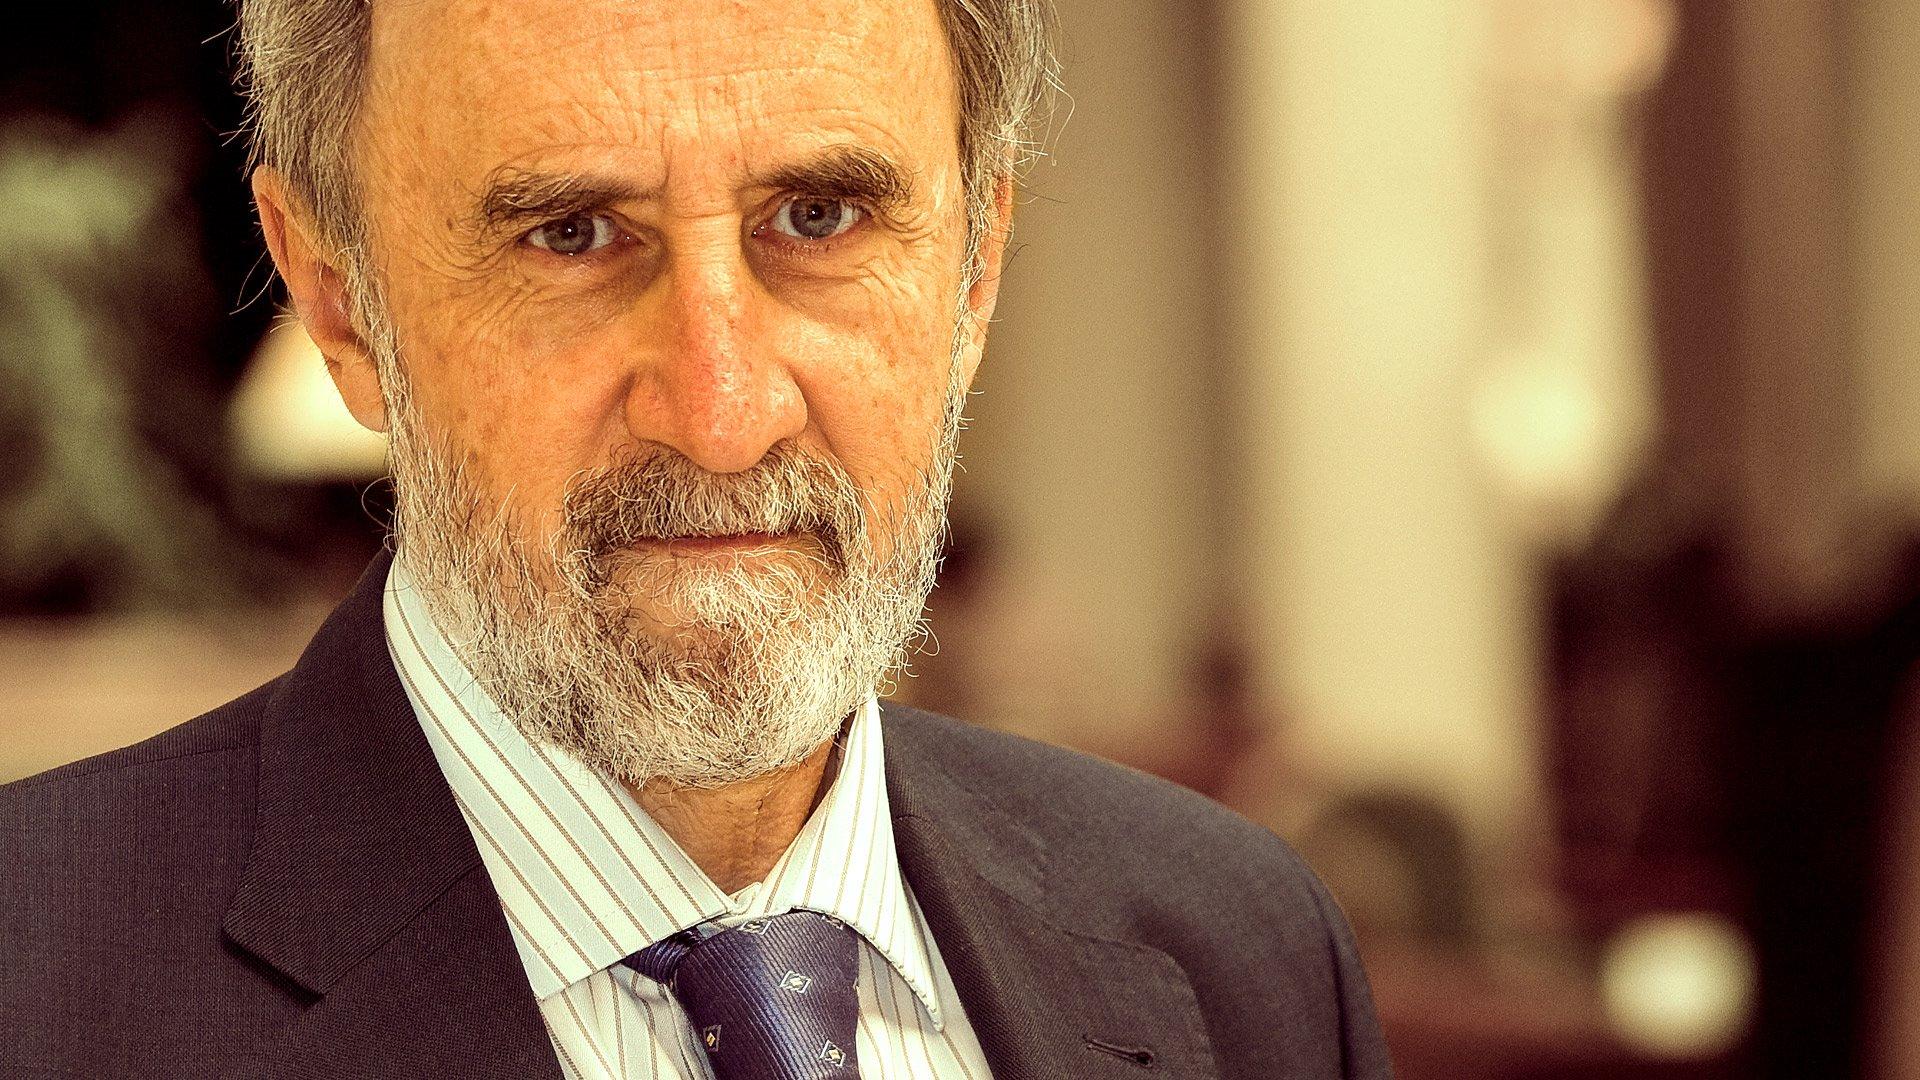 Francisco Cabrillo